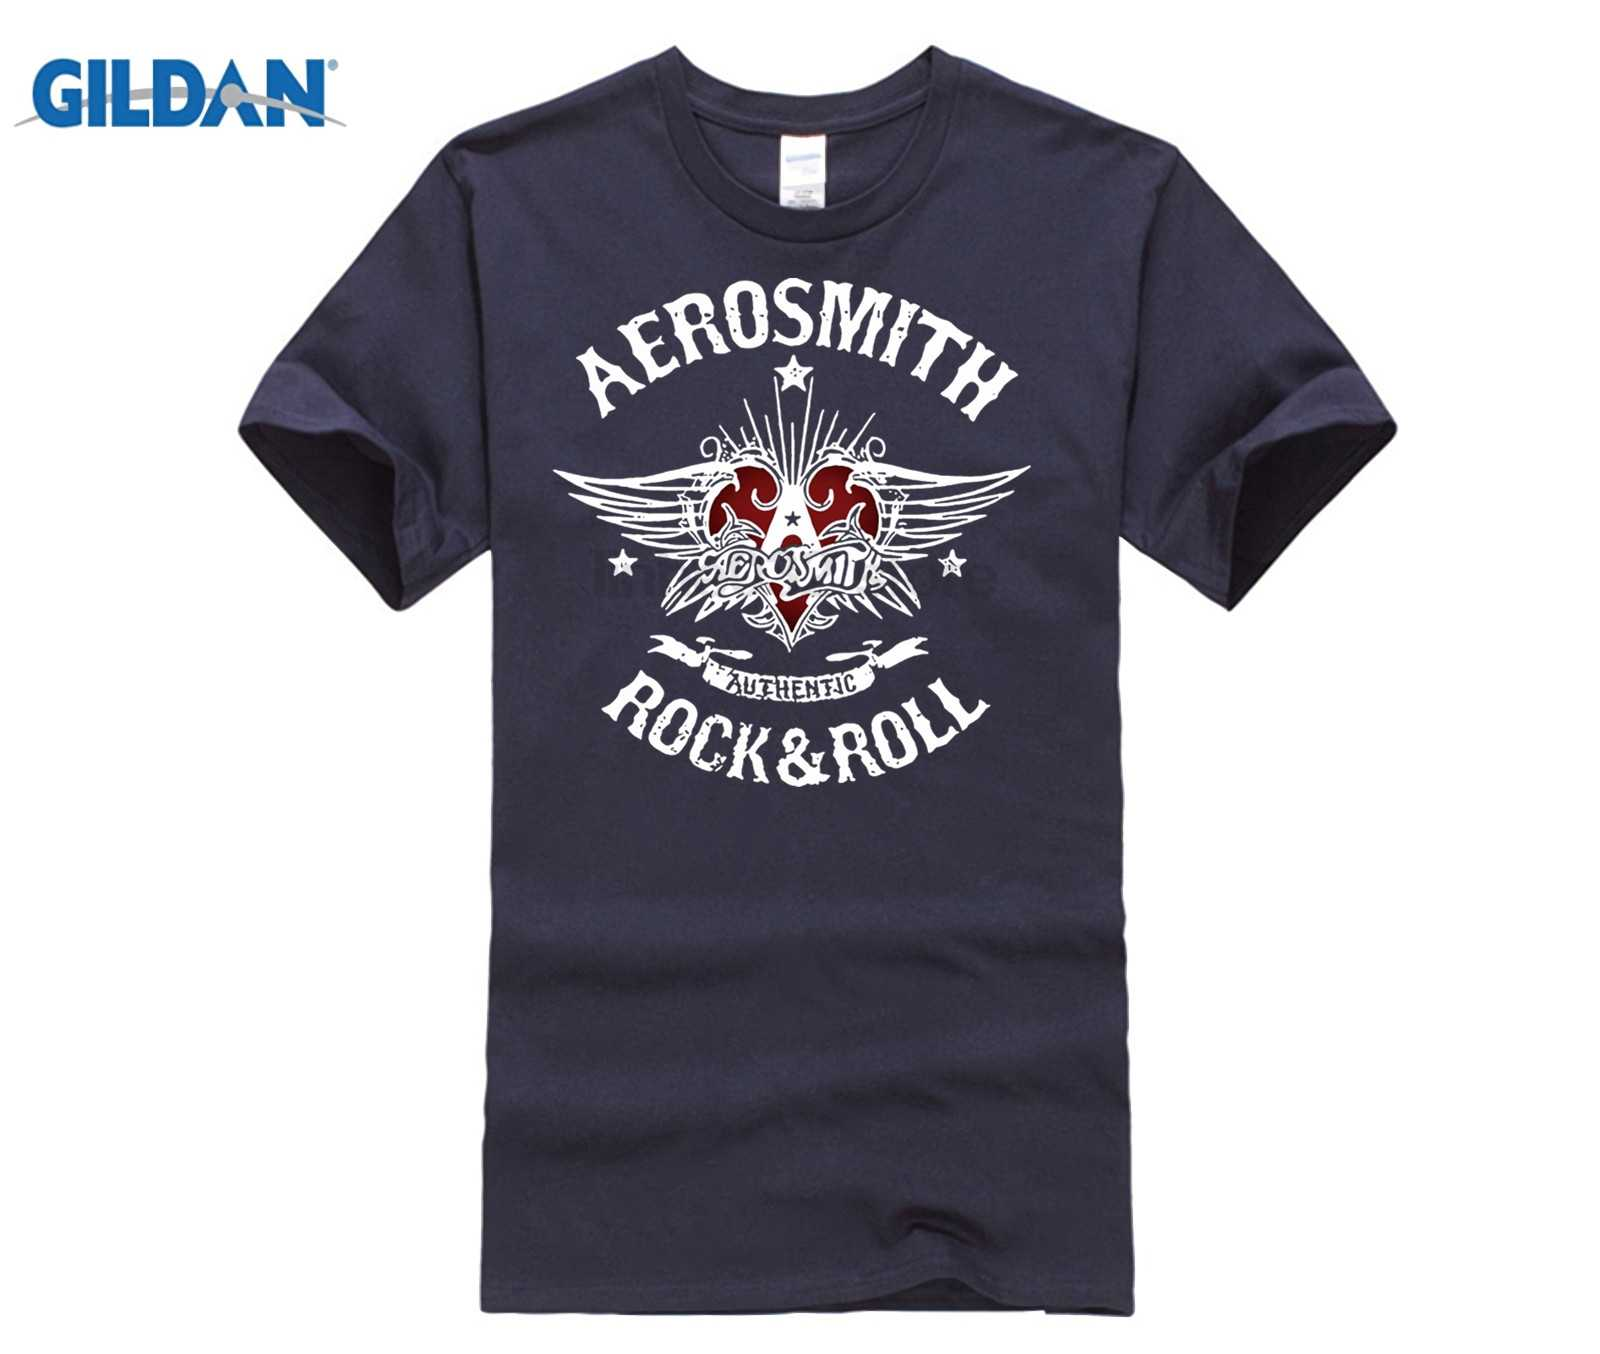 956d5e01 ... Rock Band Aerosmith Rock Roll Logo Print Mens Long T-Shirt camiseta Hip  Hop Popular ...